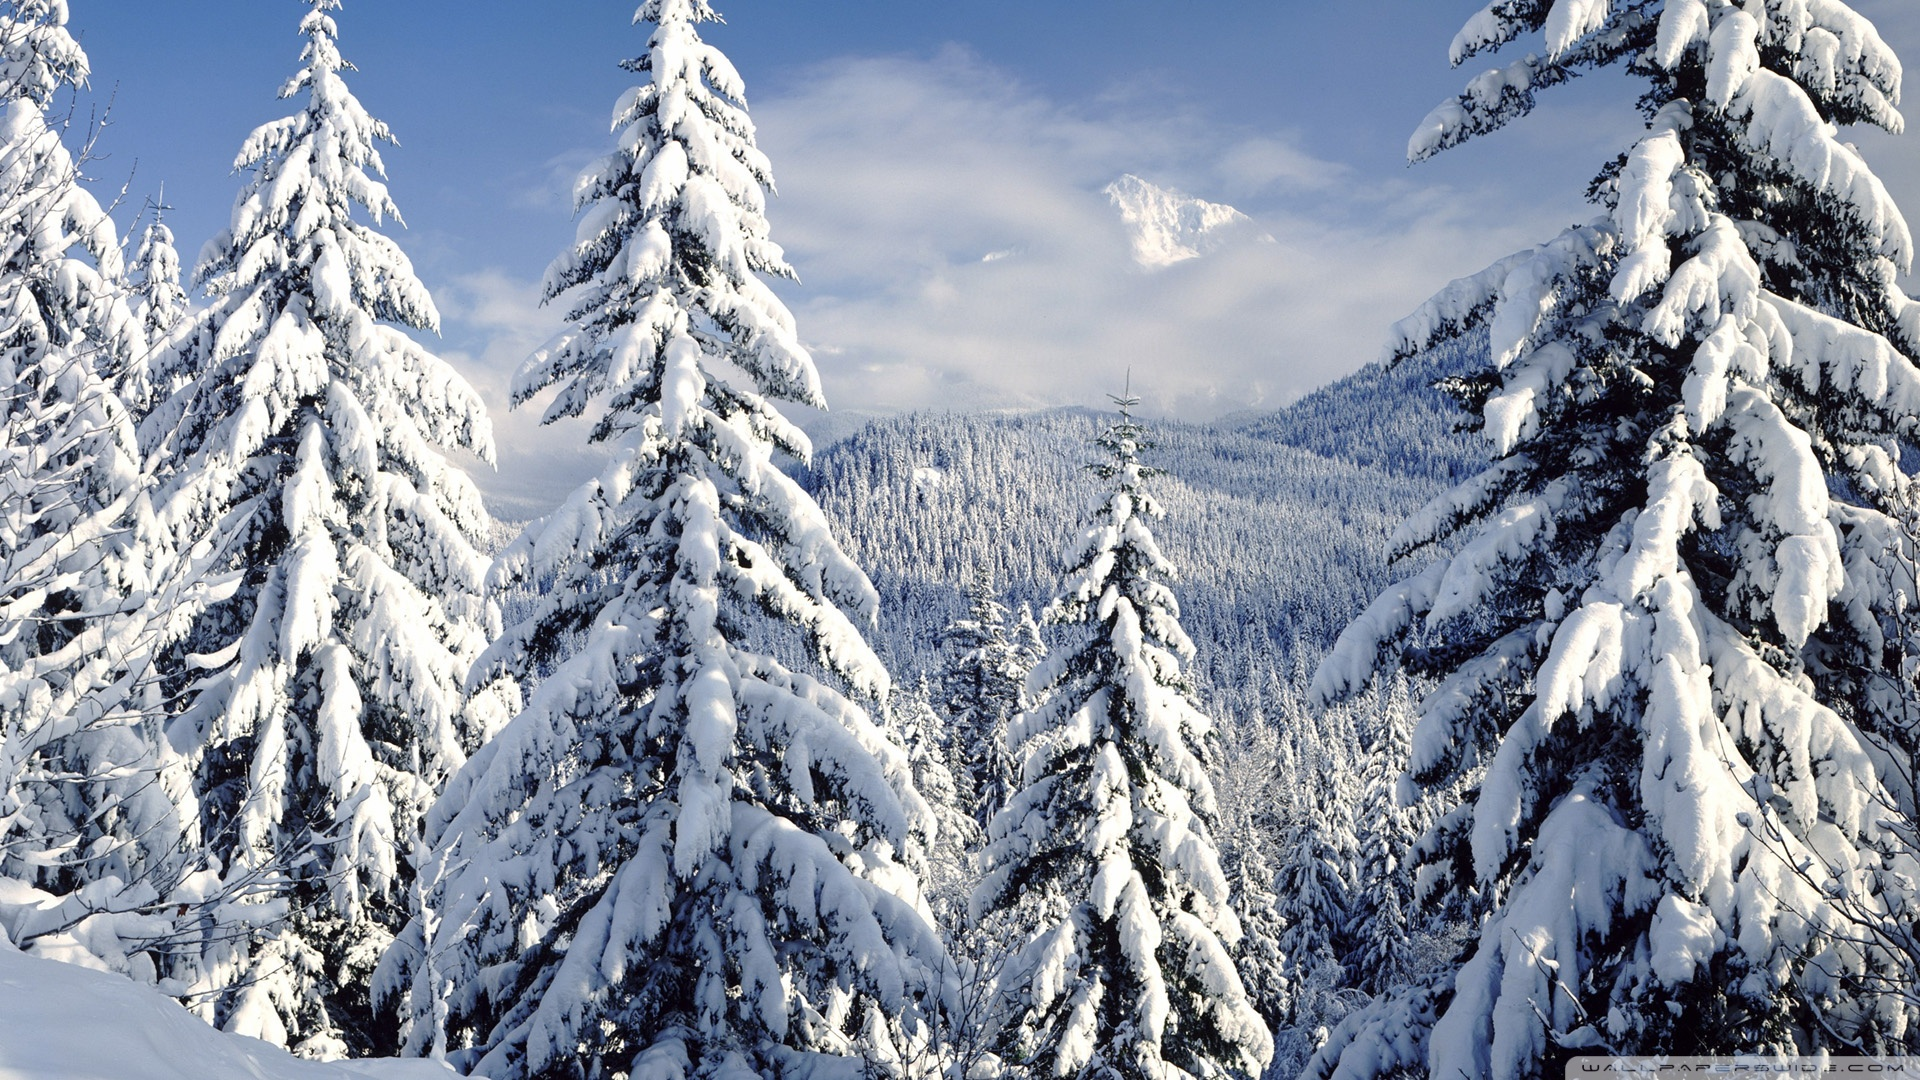 Snowy Trees wallpaper 1920x1080 79848 1920x1080